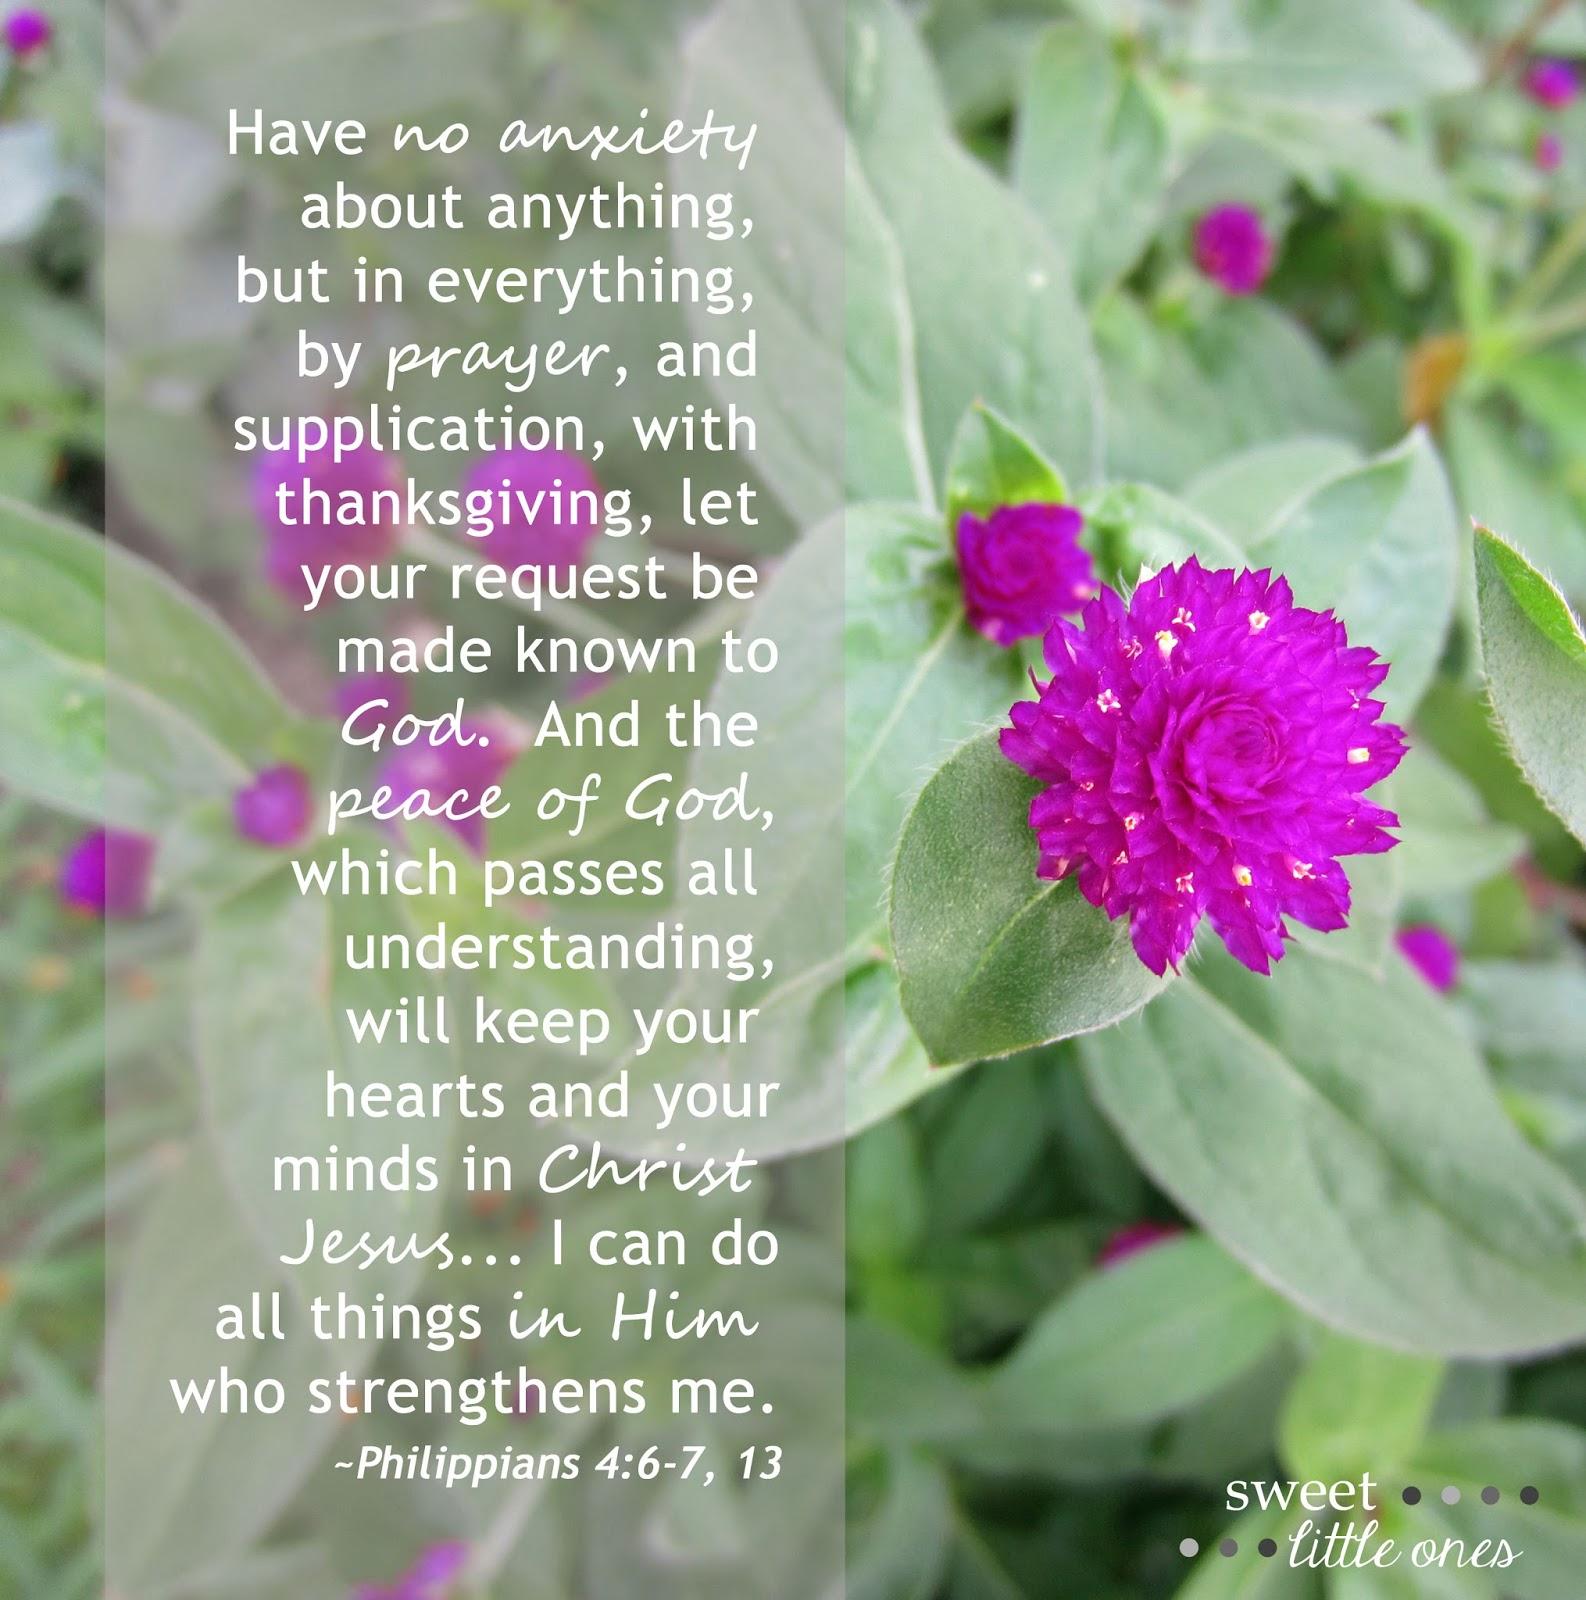 The Emotions of an Adoption Fall Through - Trust in God's Plan - Philippians 4:6-7, 13 - www.sweetlittleonesblog.com